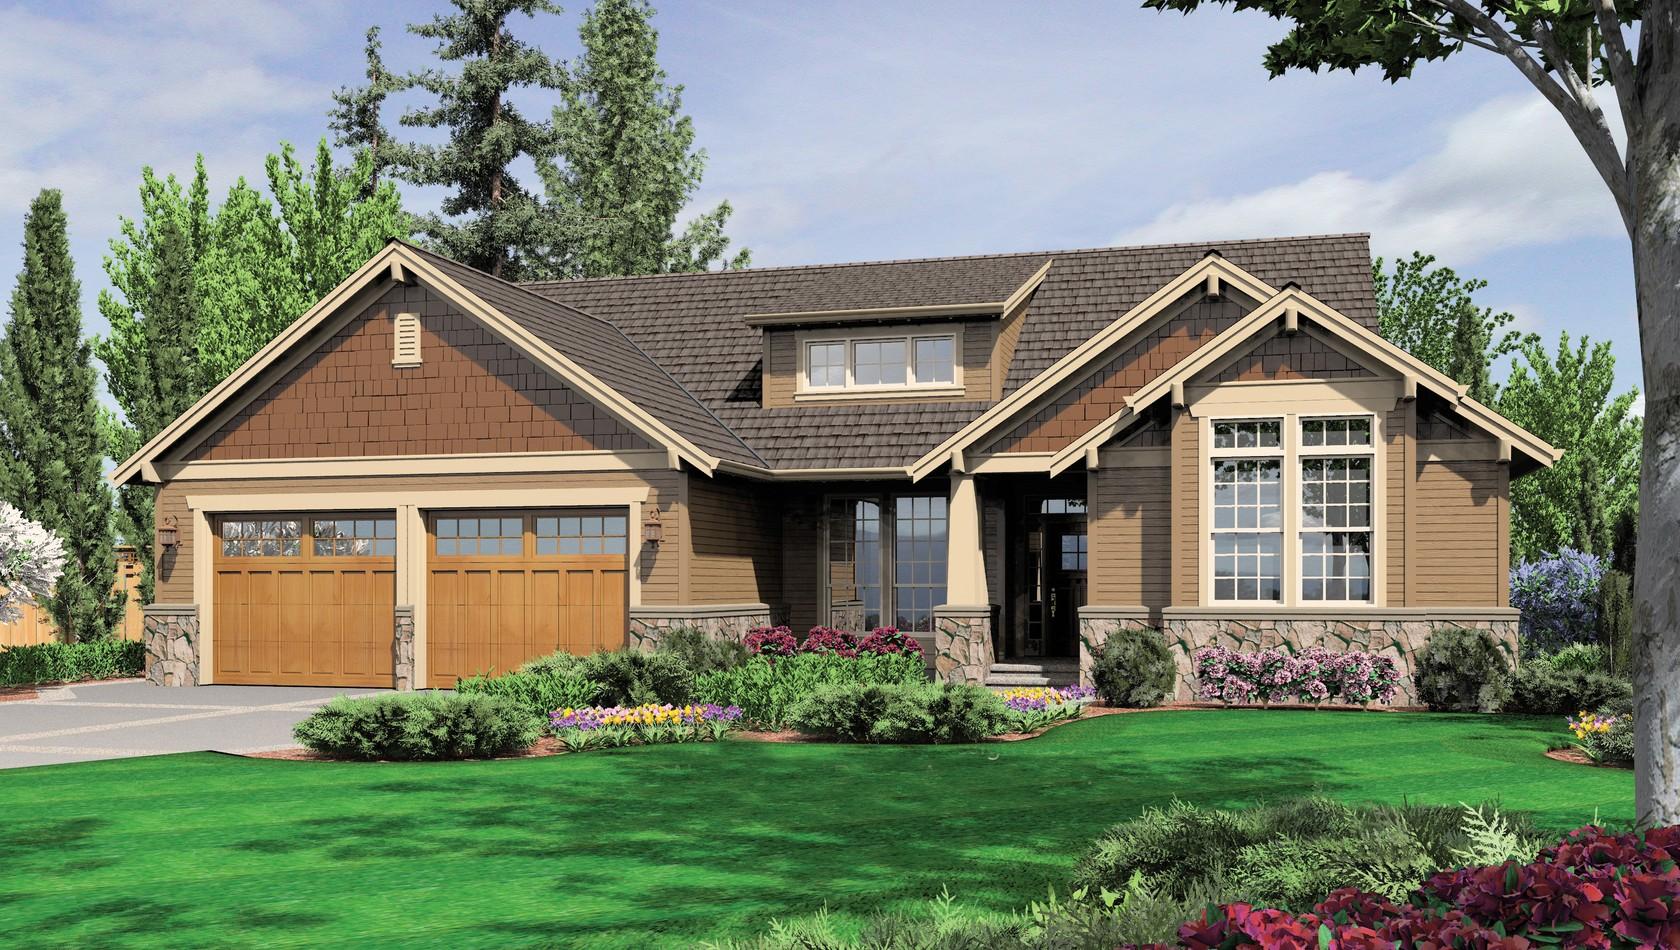 Main image for house plan 1201J: The Dawson